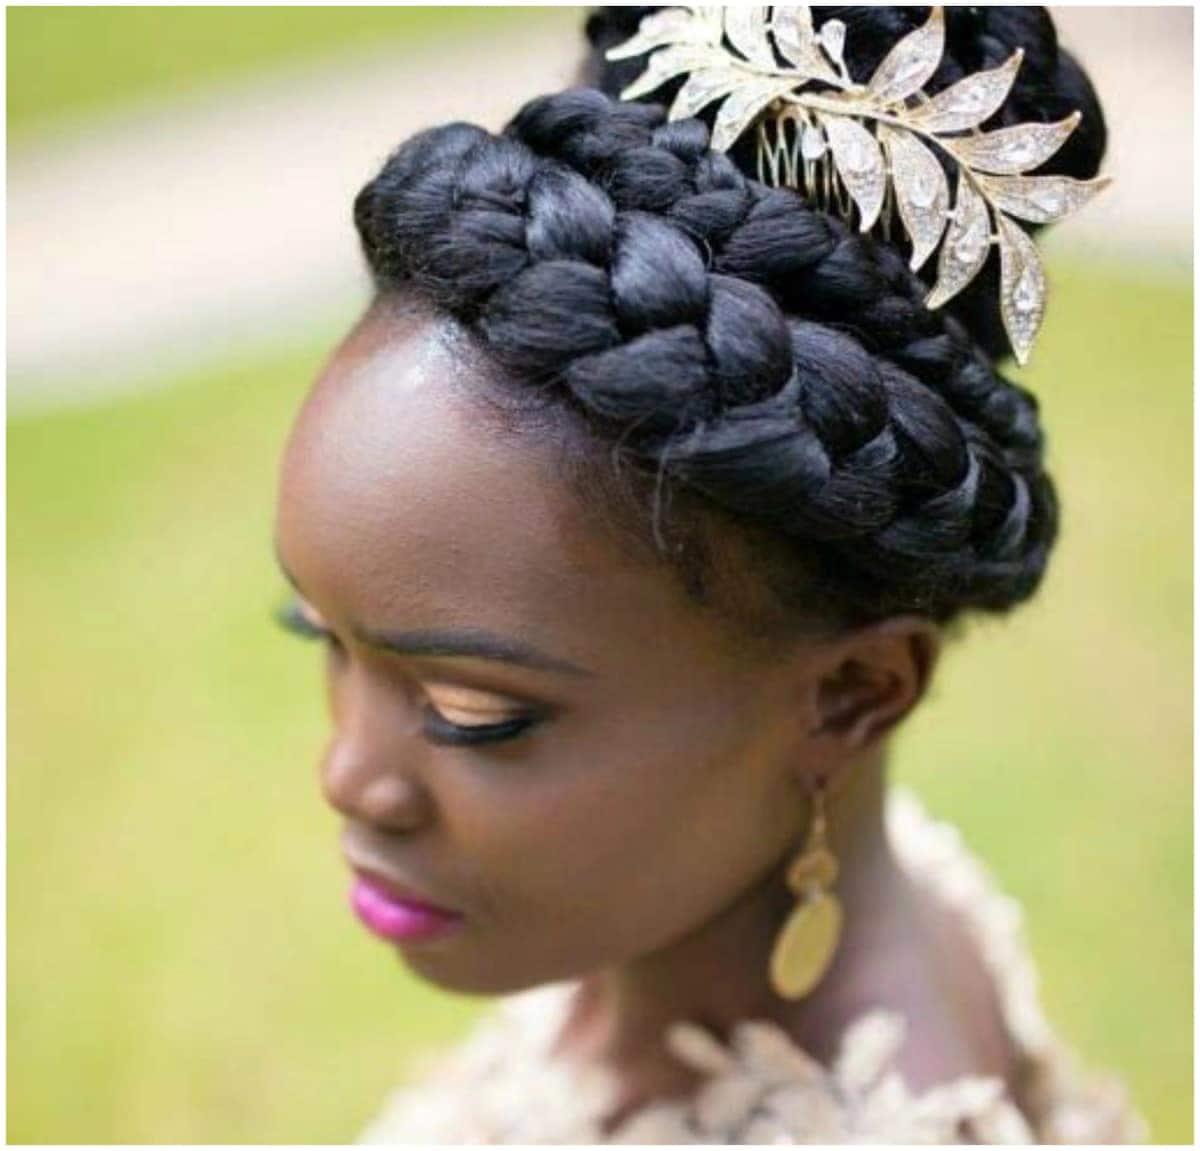 Kenyan bridal hairstyles for natural hair Latest Kenyan ladies hairstyles Hairstyles for Kenya hair